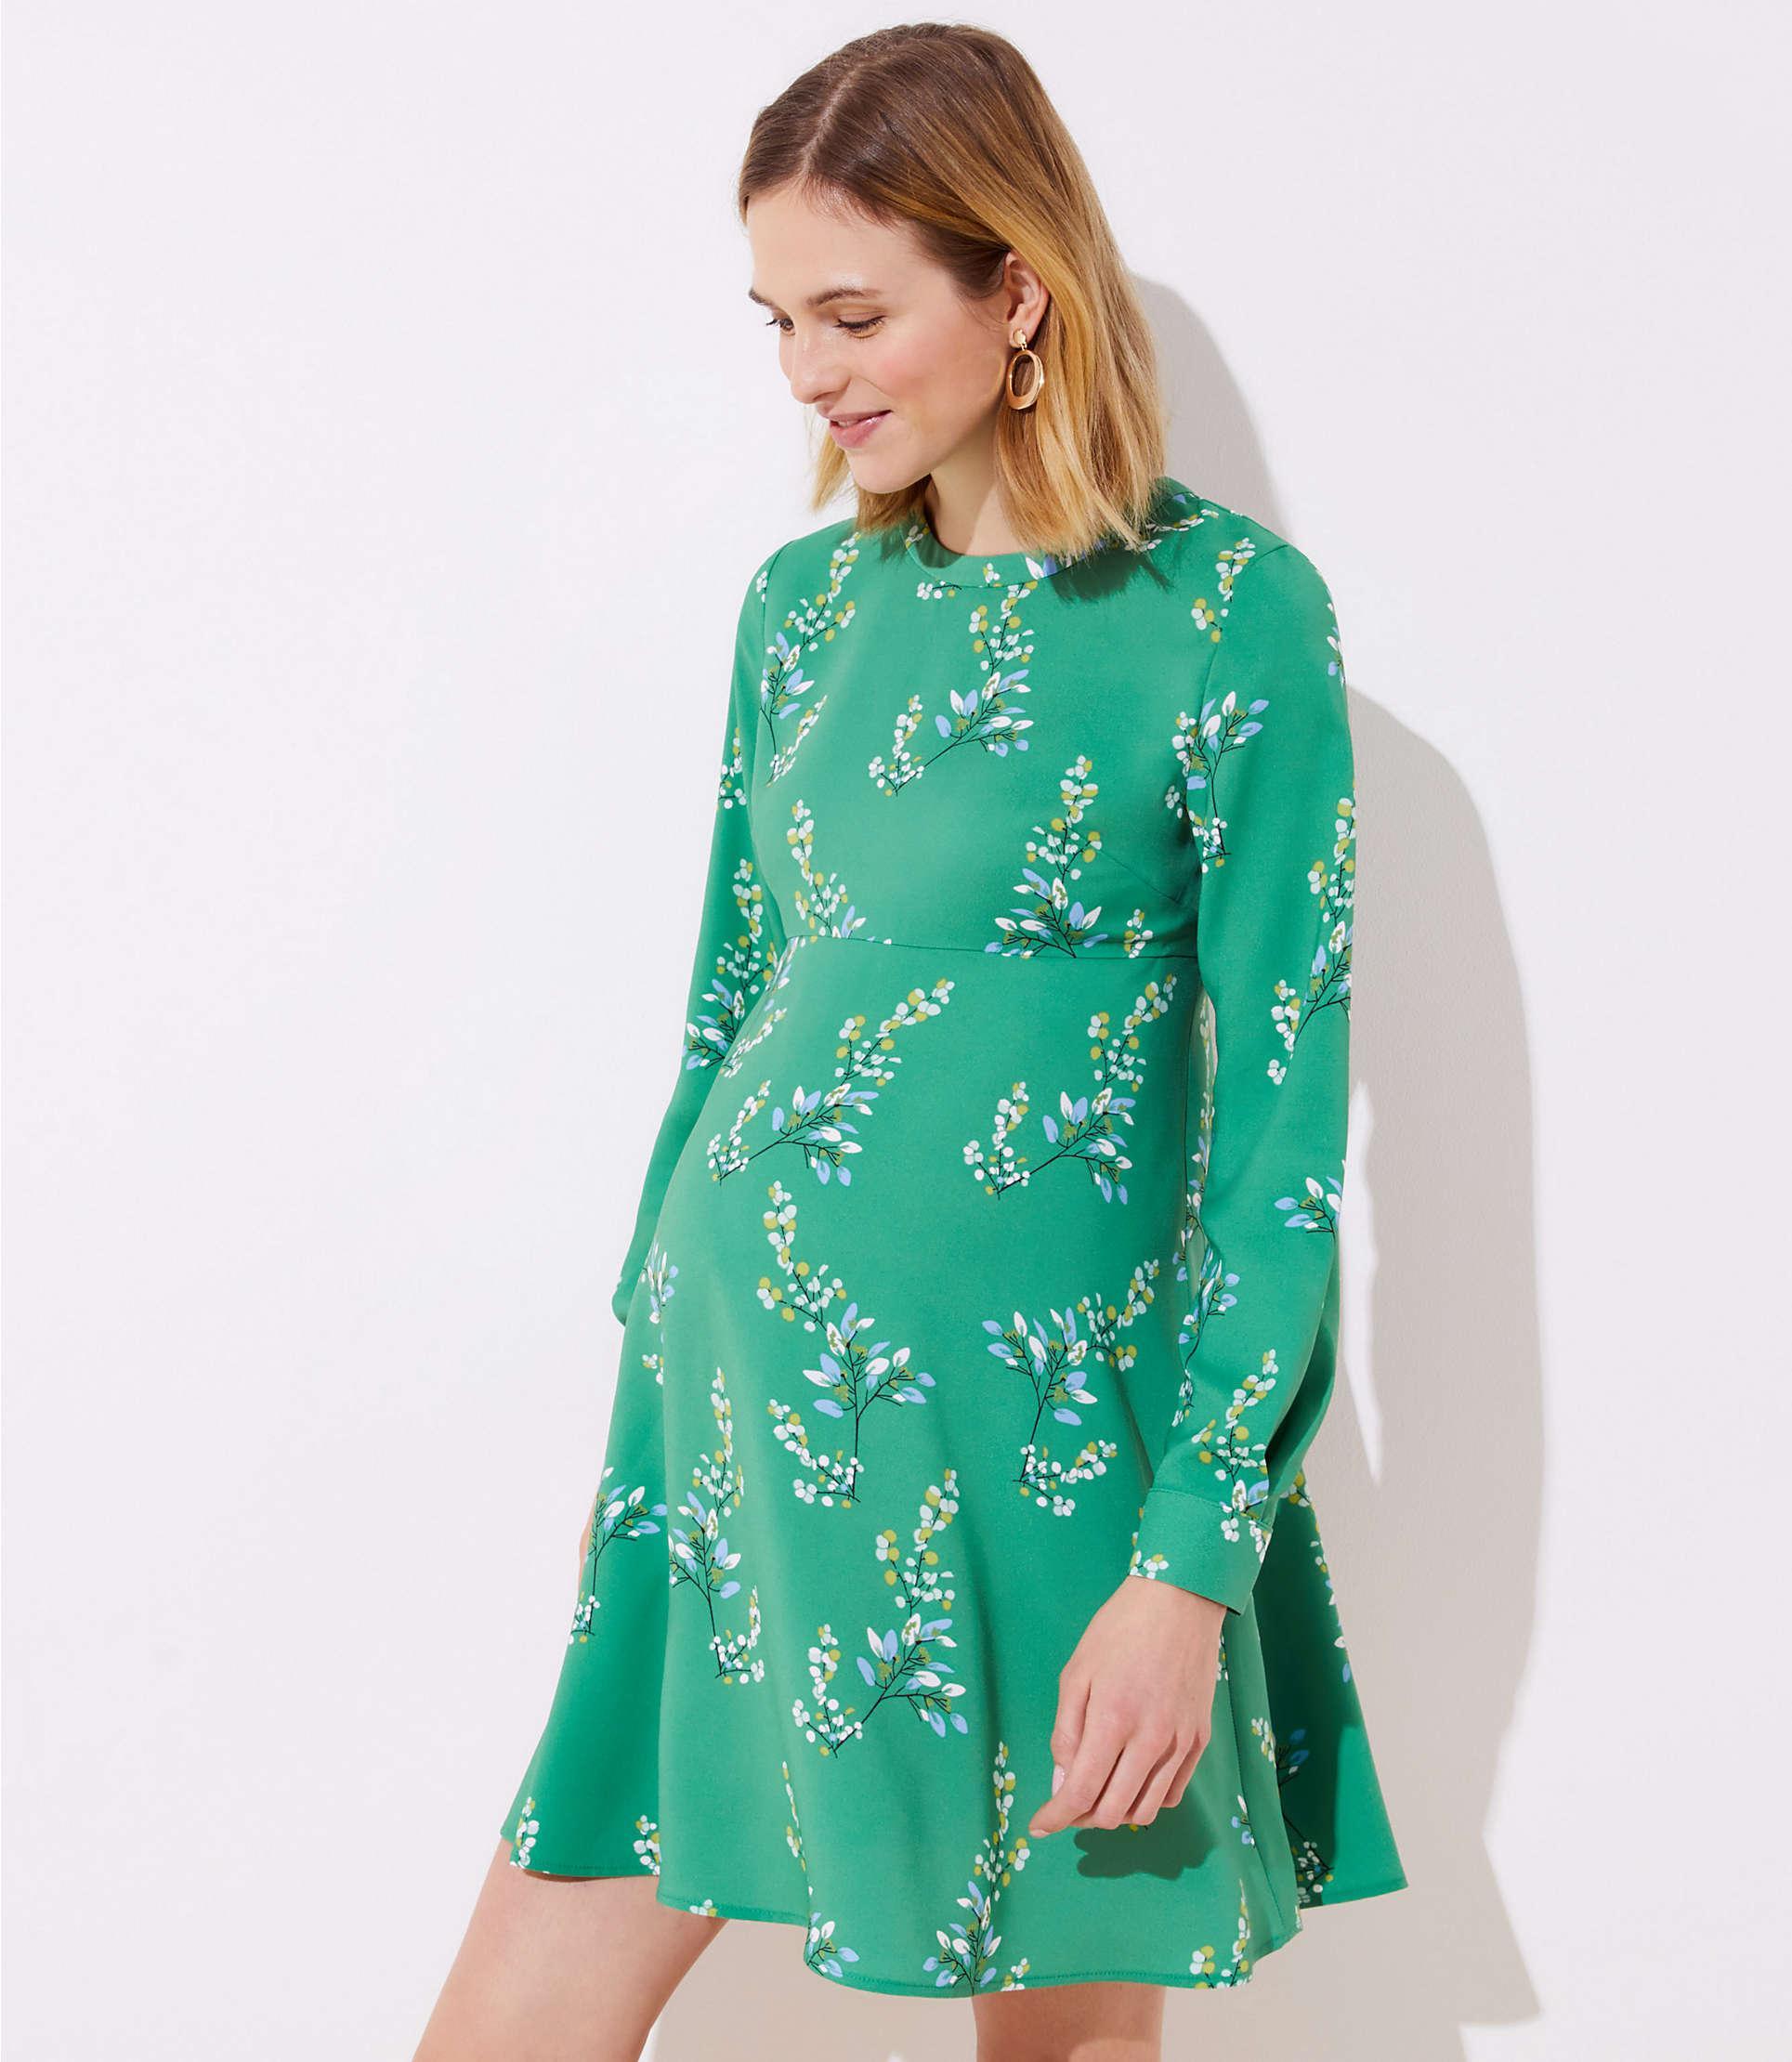 7e2f311b227a0 Lyst - LOFT Maternity Flower Branch Flare Shirtdress in Green